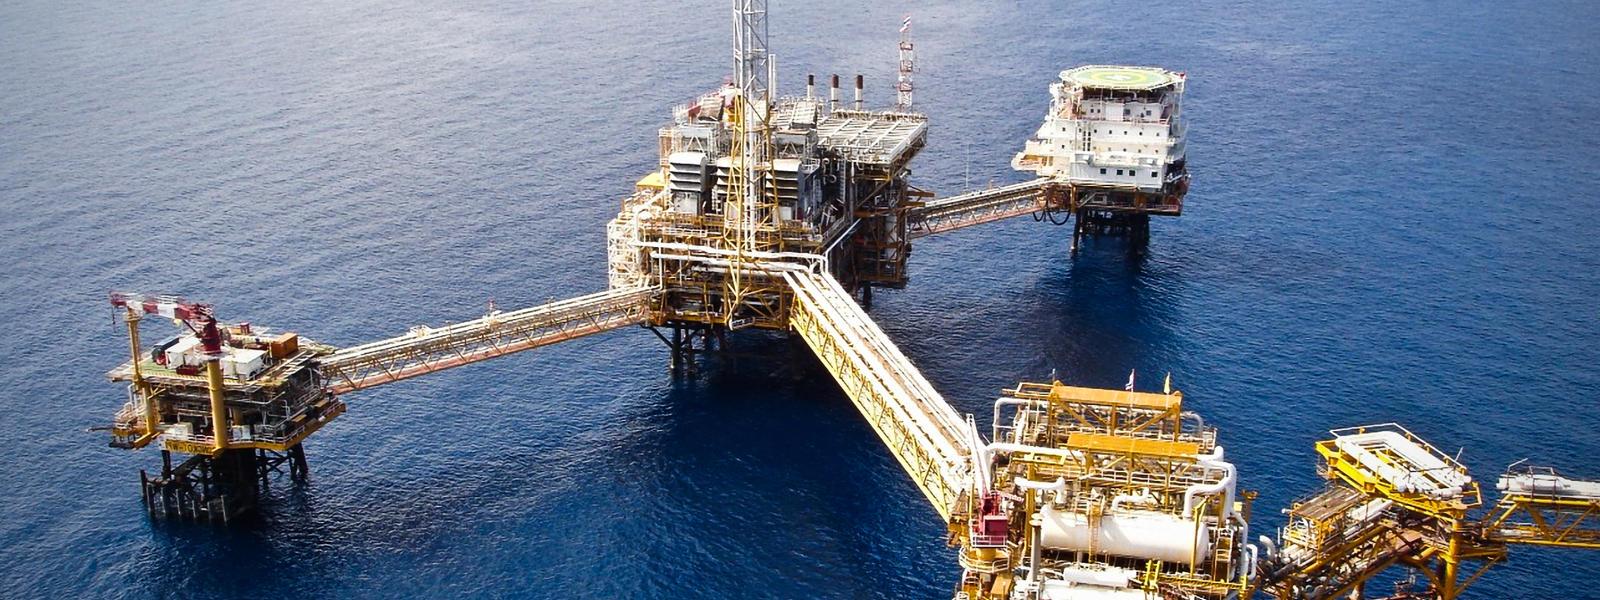 Oil And Gas Development Threats Wwf